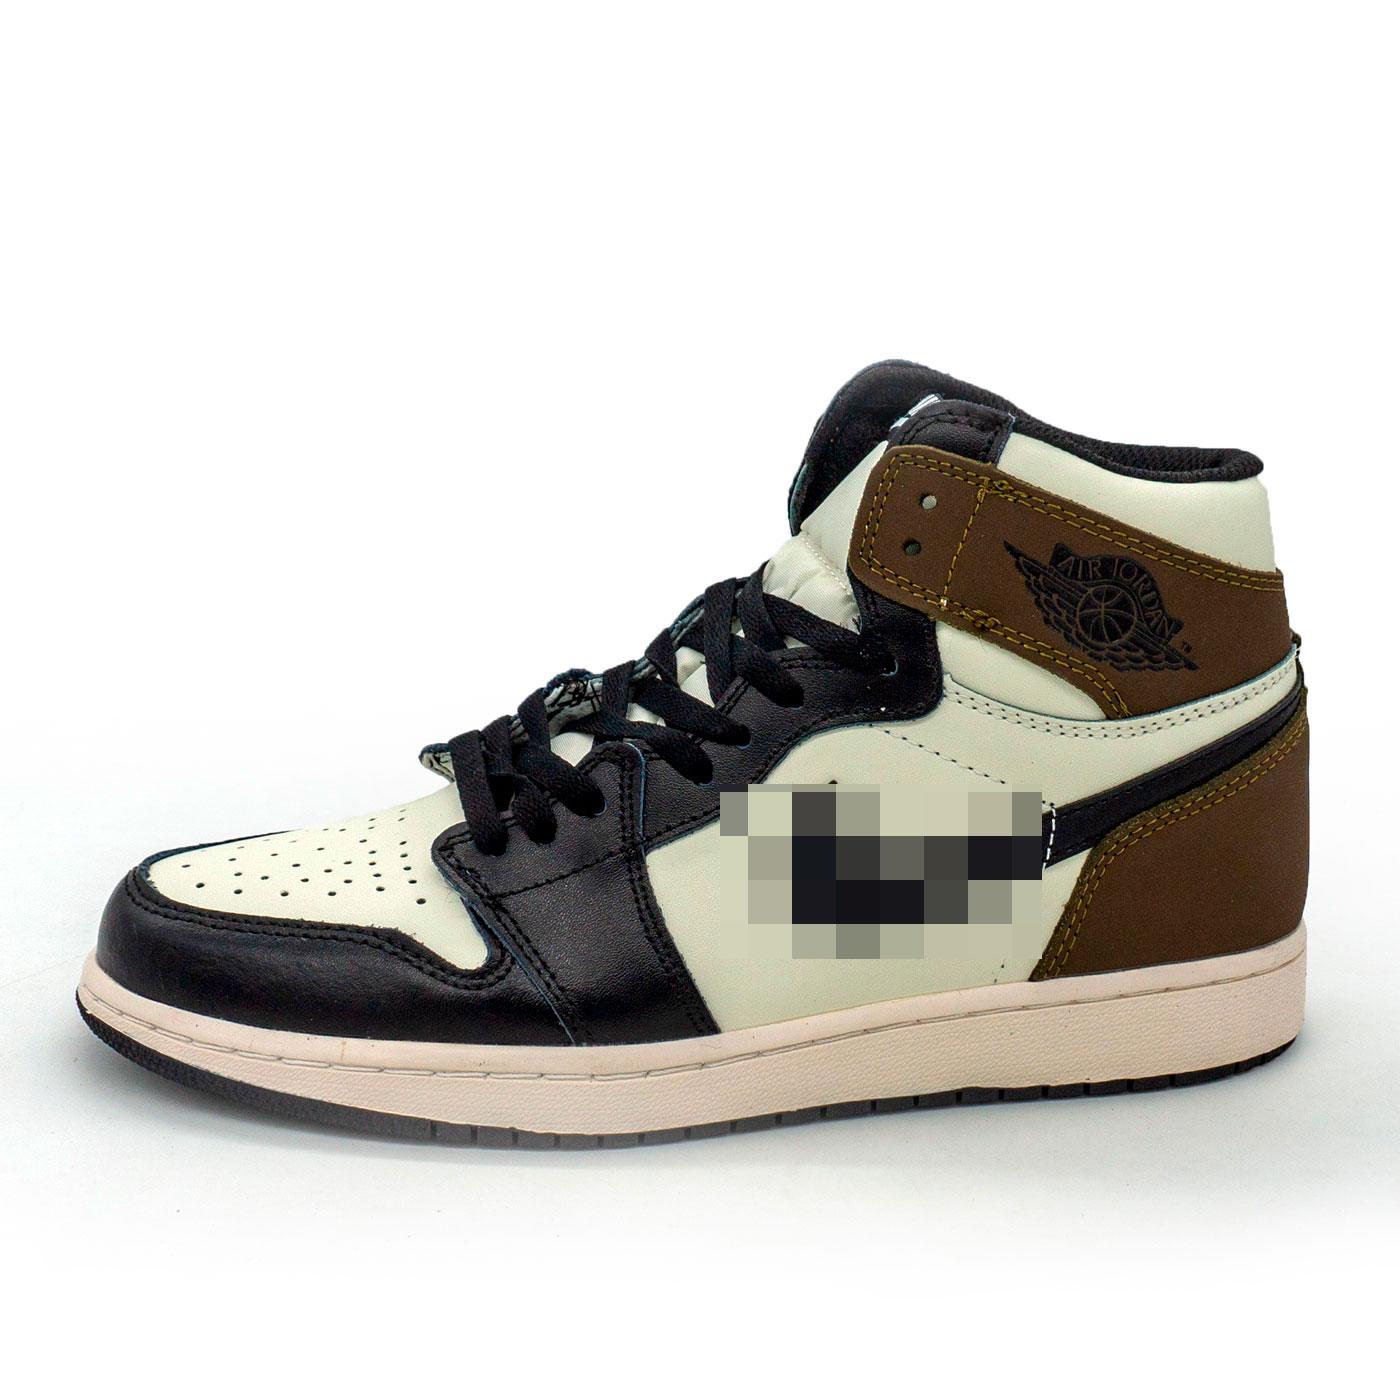 фото main Высокие черно белые хаки кроссовки Nke Air Jordan 1 High. Топ качество! main